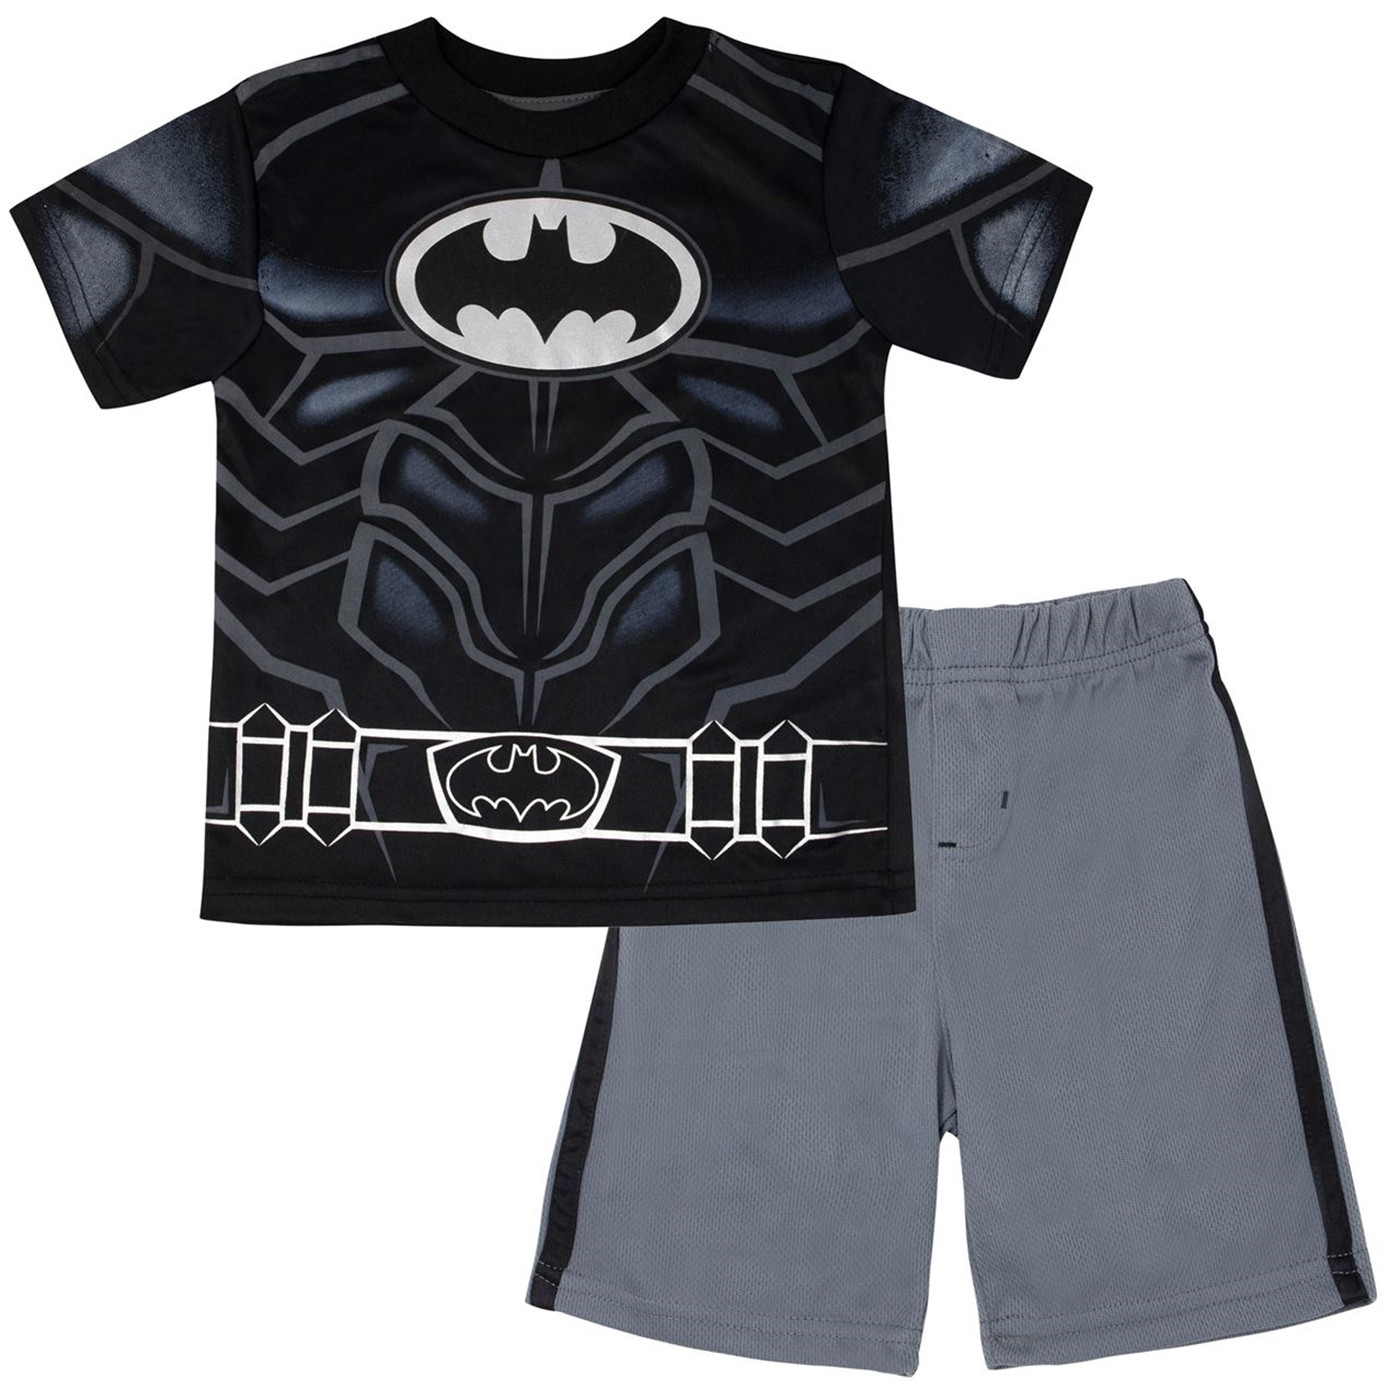 Batman Performance Costume Kids Short Set